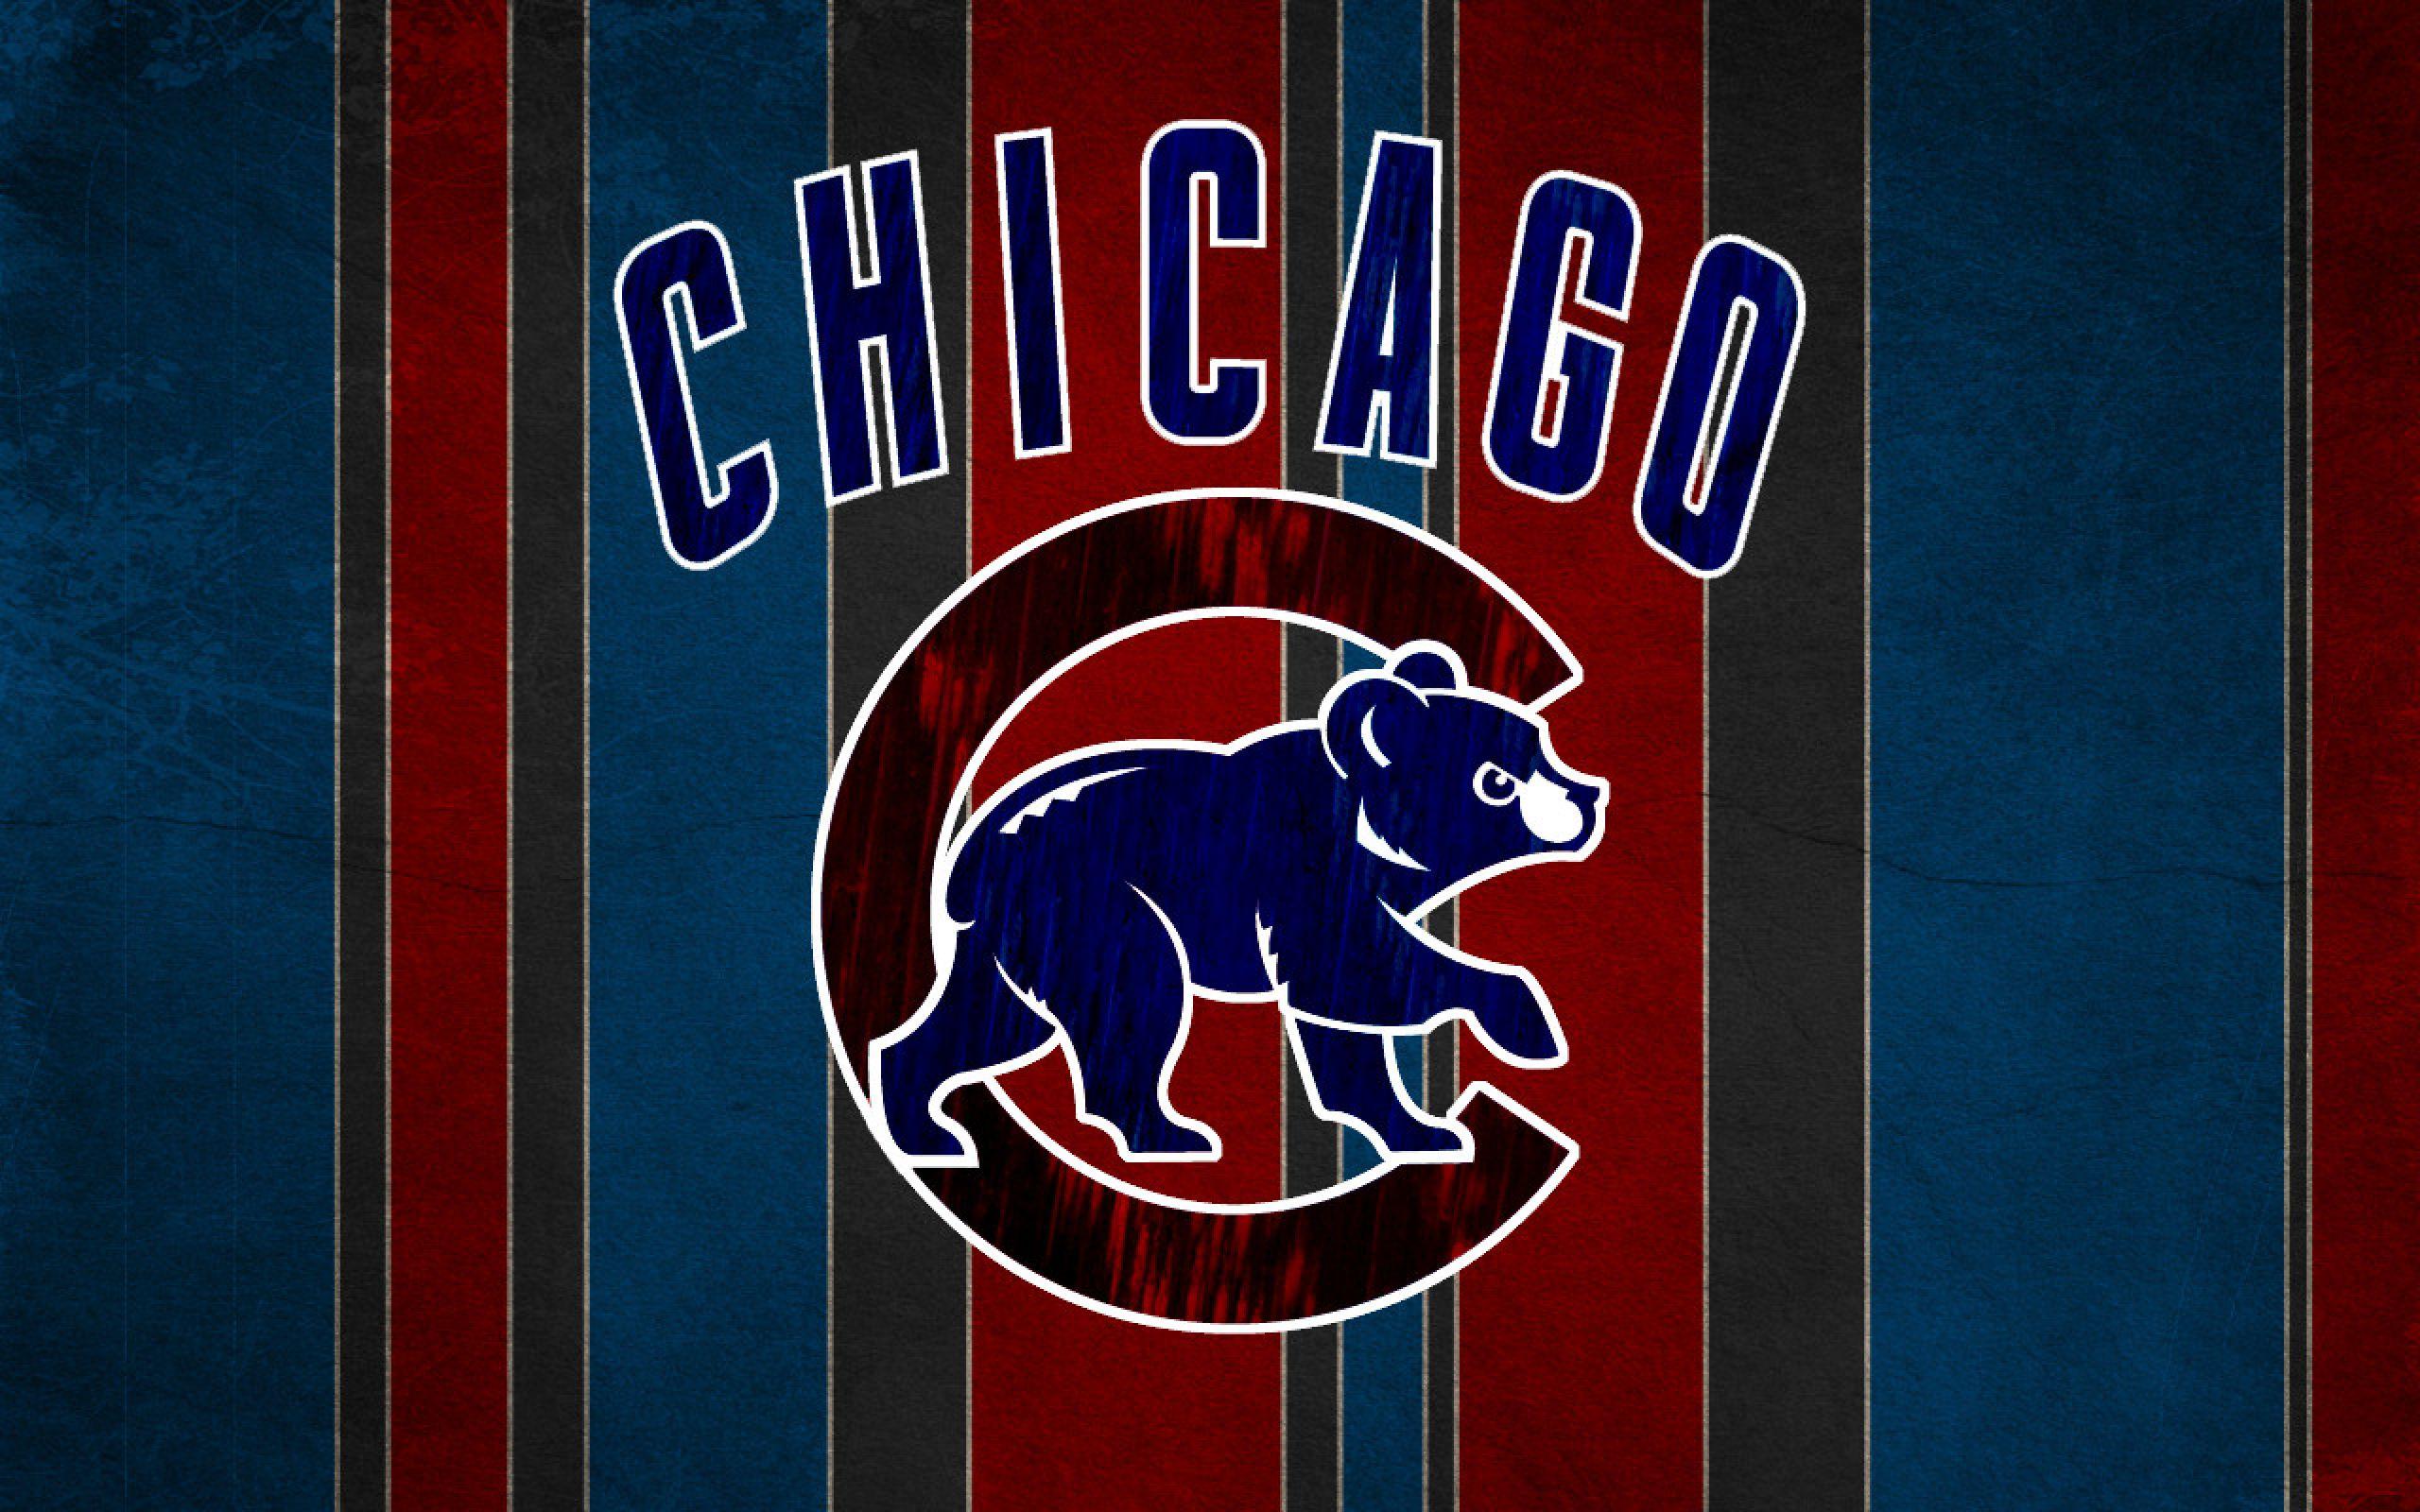 CHICAGO CUBS mlb baseball 58 wallpaper 2560x1600 232586 2560x1600